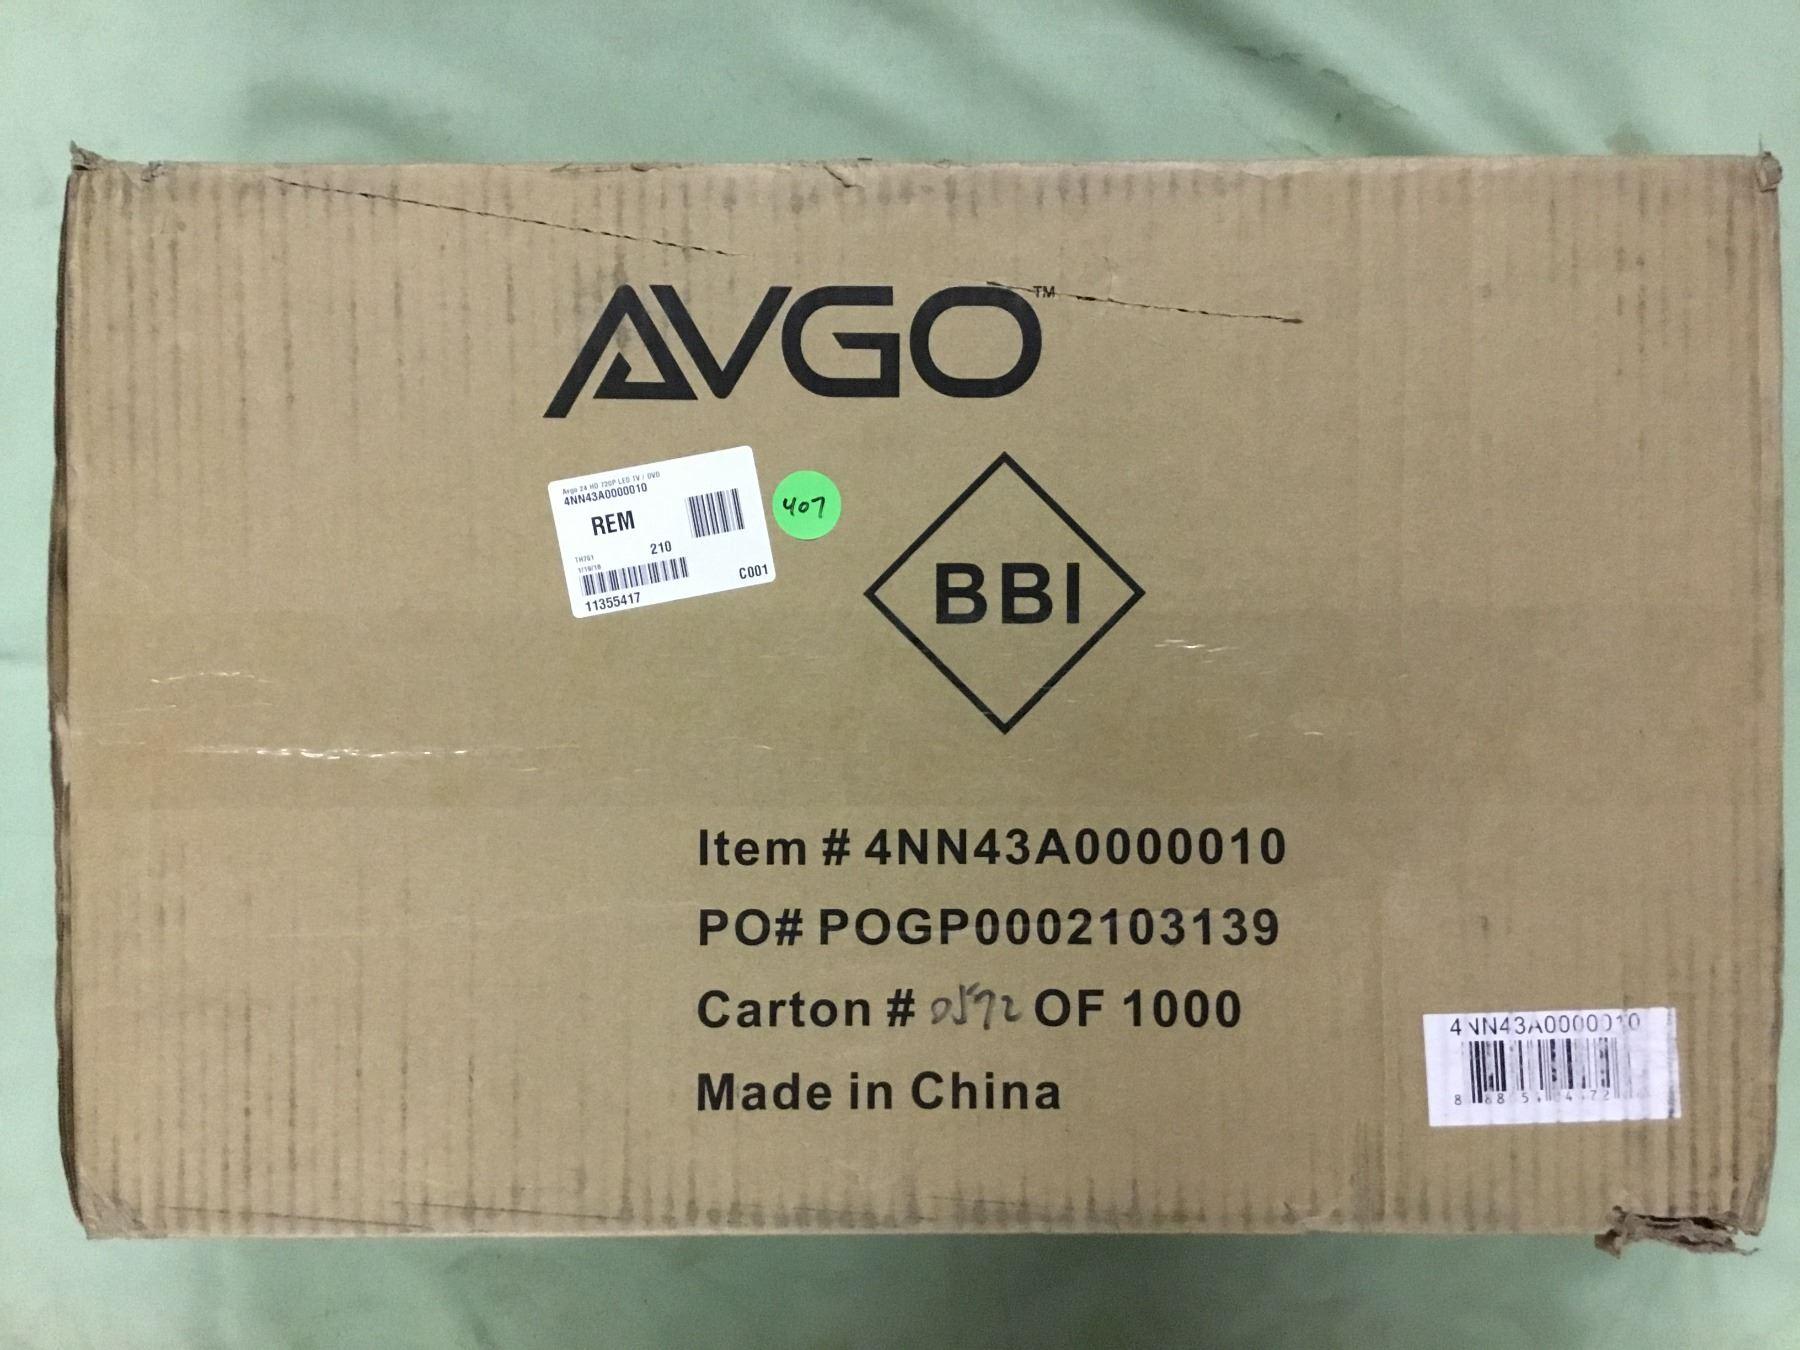 Who makes avgo tvs   AVGO Trademark Application of Bluestem